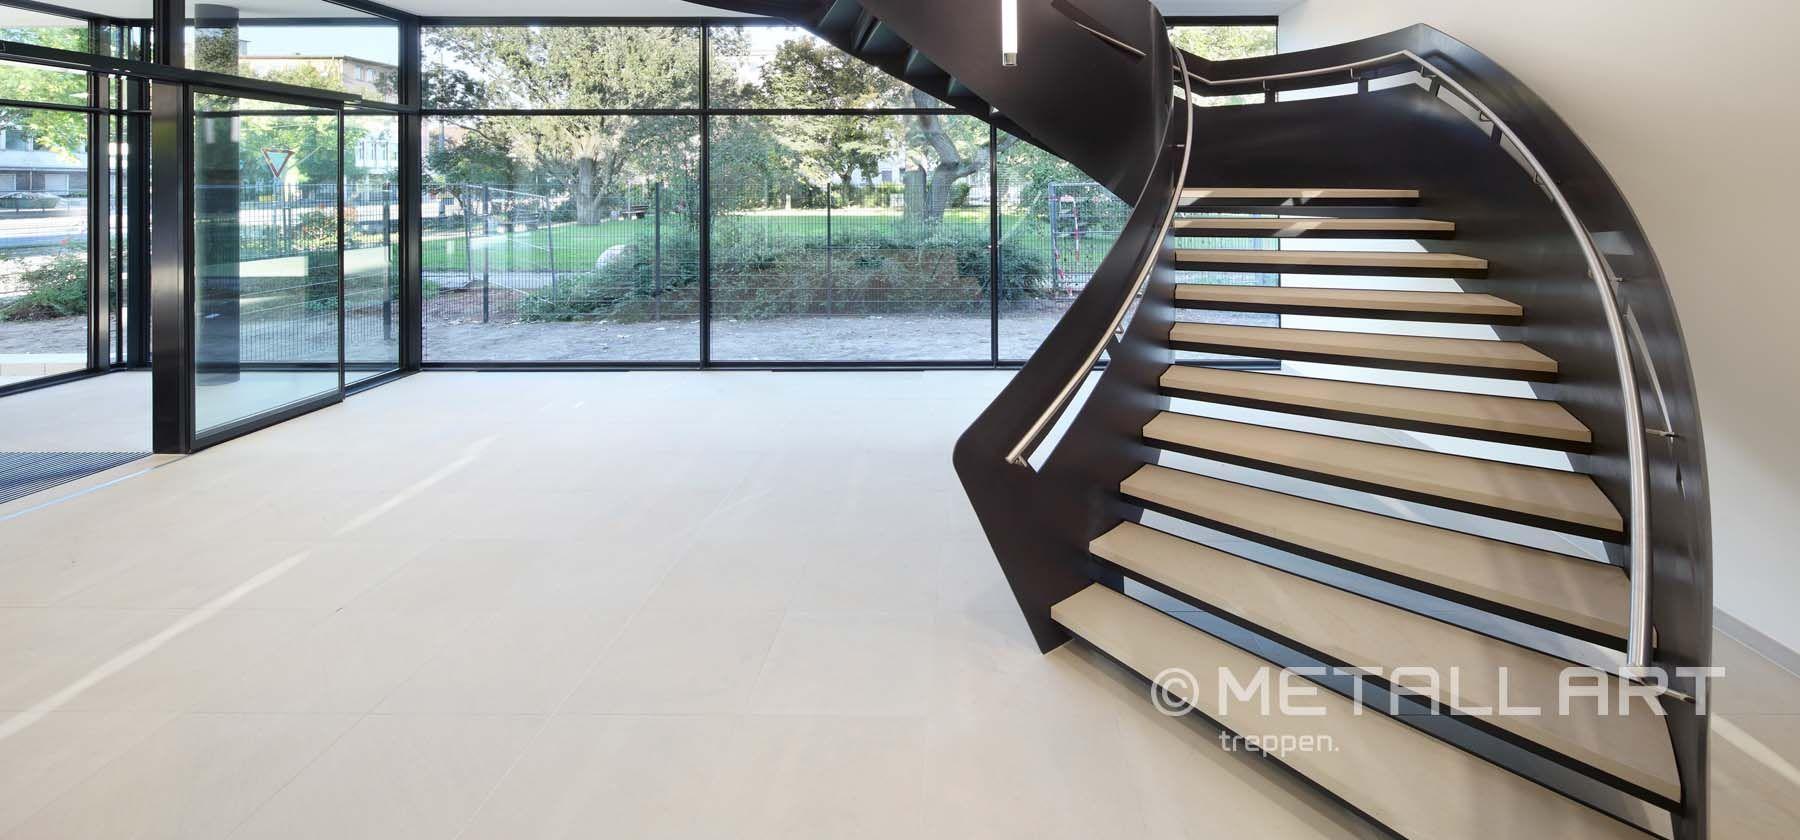 Stahltreppen dreiecksförmig   MetallArt Metallbau Schmid GmbH